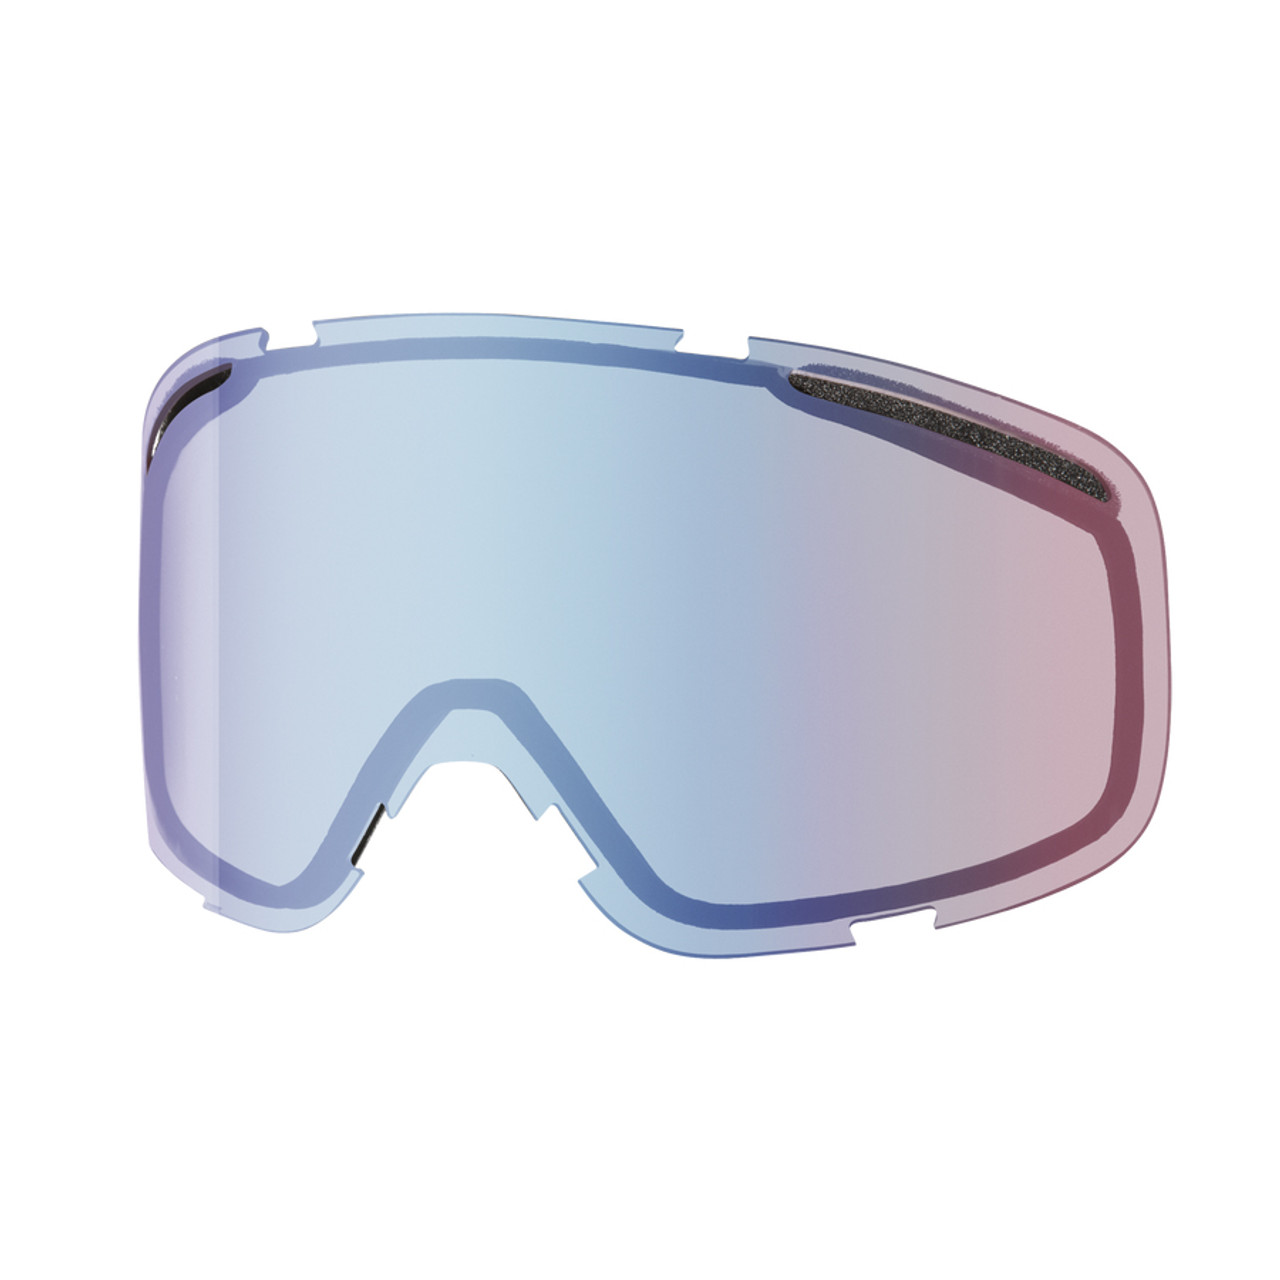 Blue Sensor Mirror - Smith Vogue Replacement Lenses